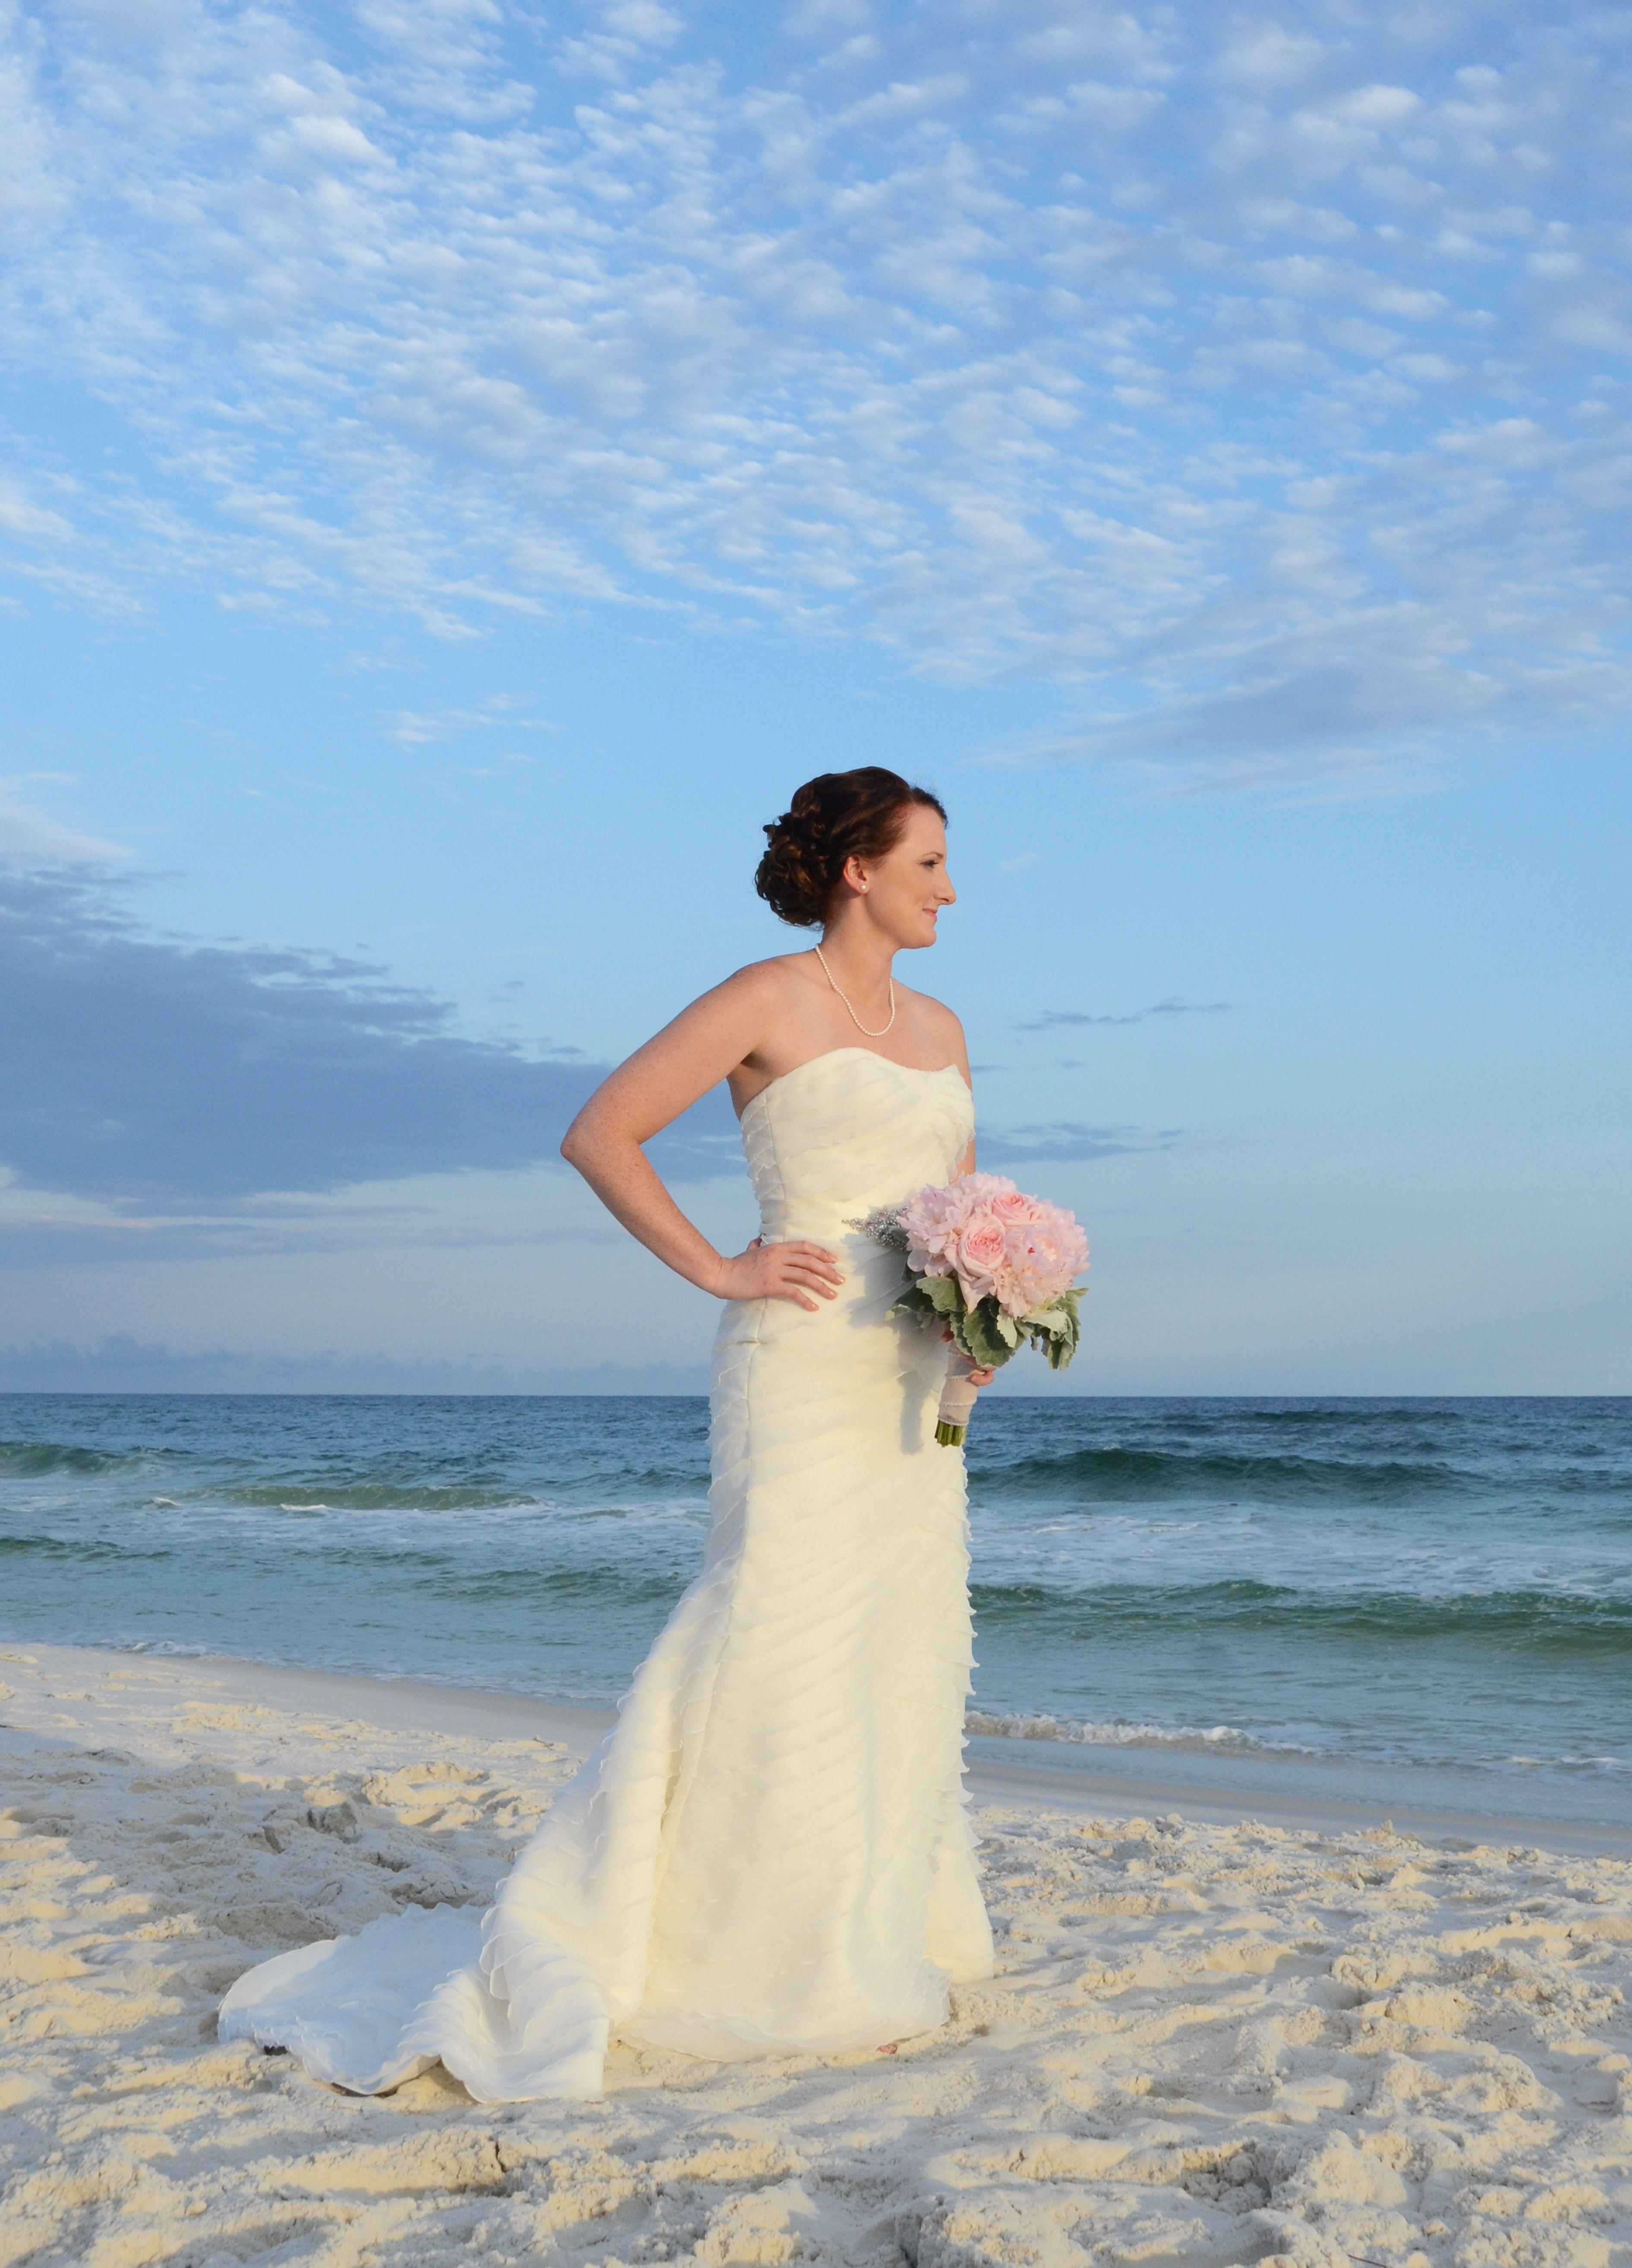 Beach weddings fort walton beach wedding packages sunset beach - Okaloosa Island Fort Walton Beach Florida Destination Beach Wedding